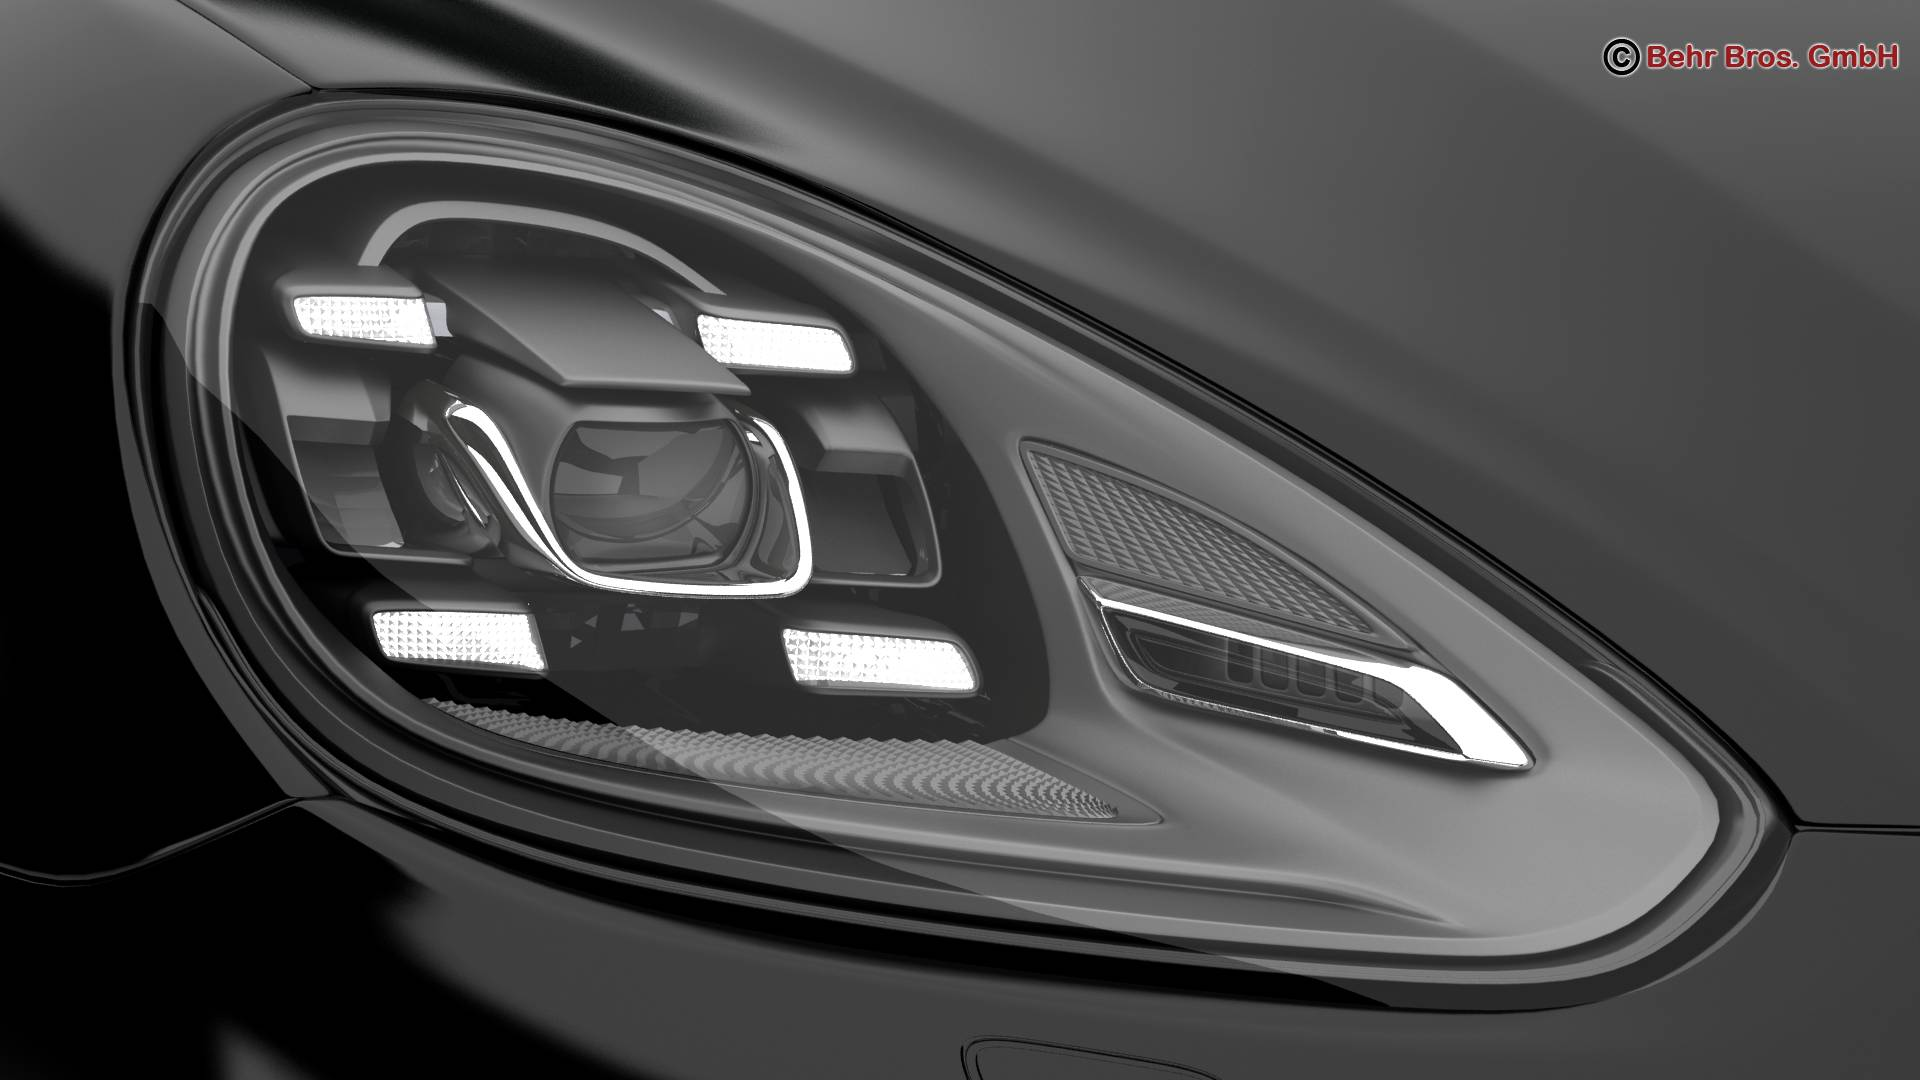 porsche cayenne turbo s 2016 3d model 3ds max fbx c4d lwo ma mb obj 214935